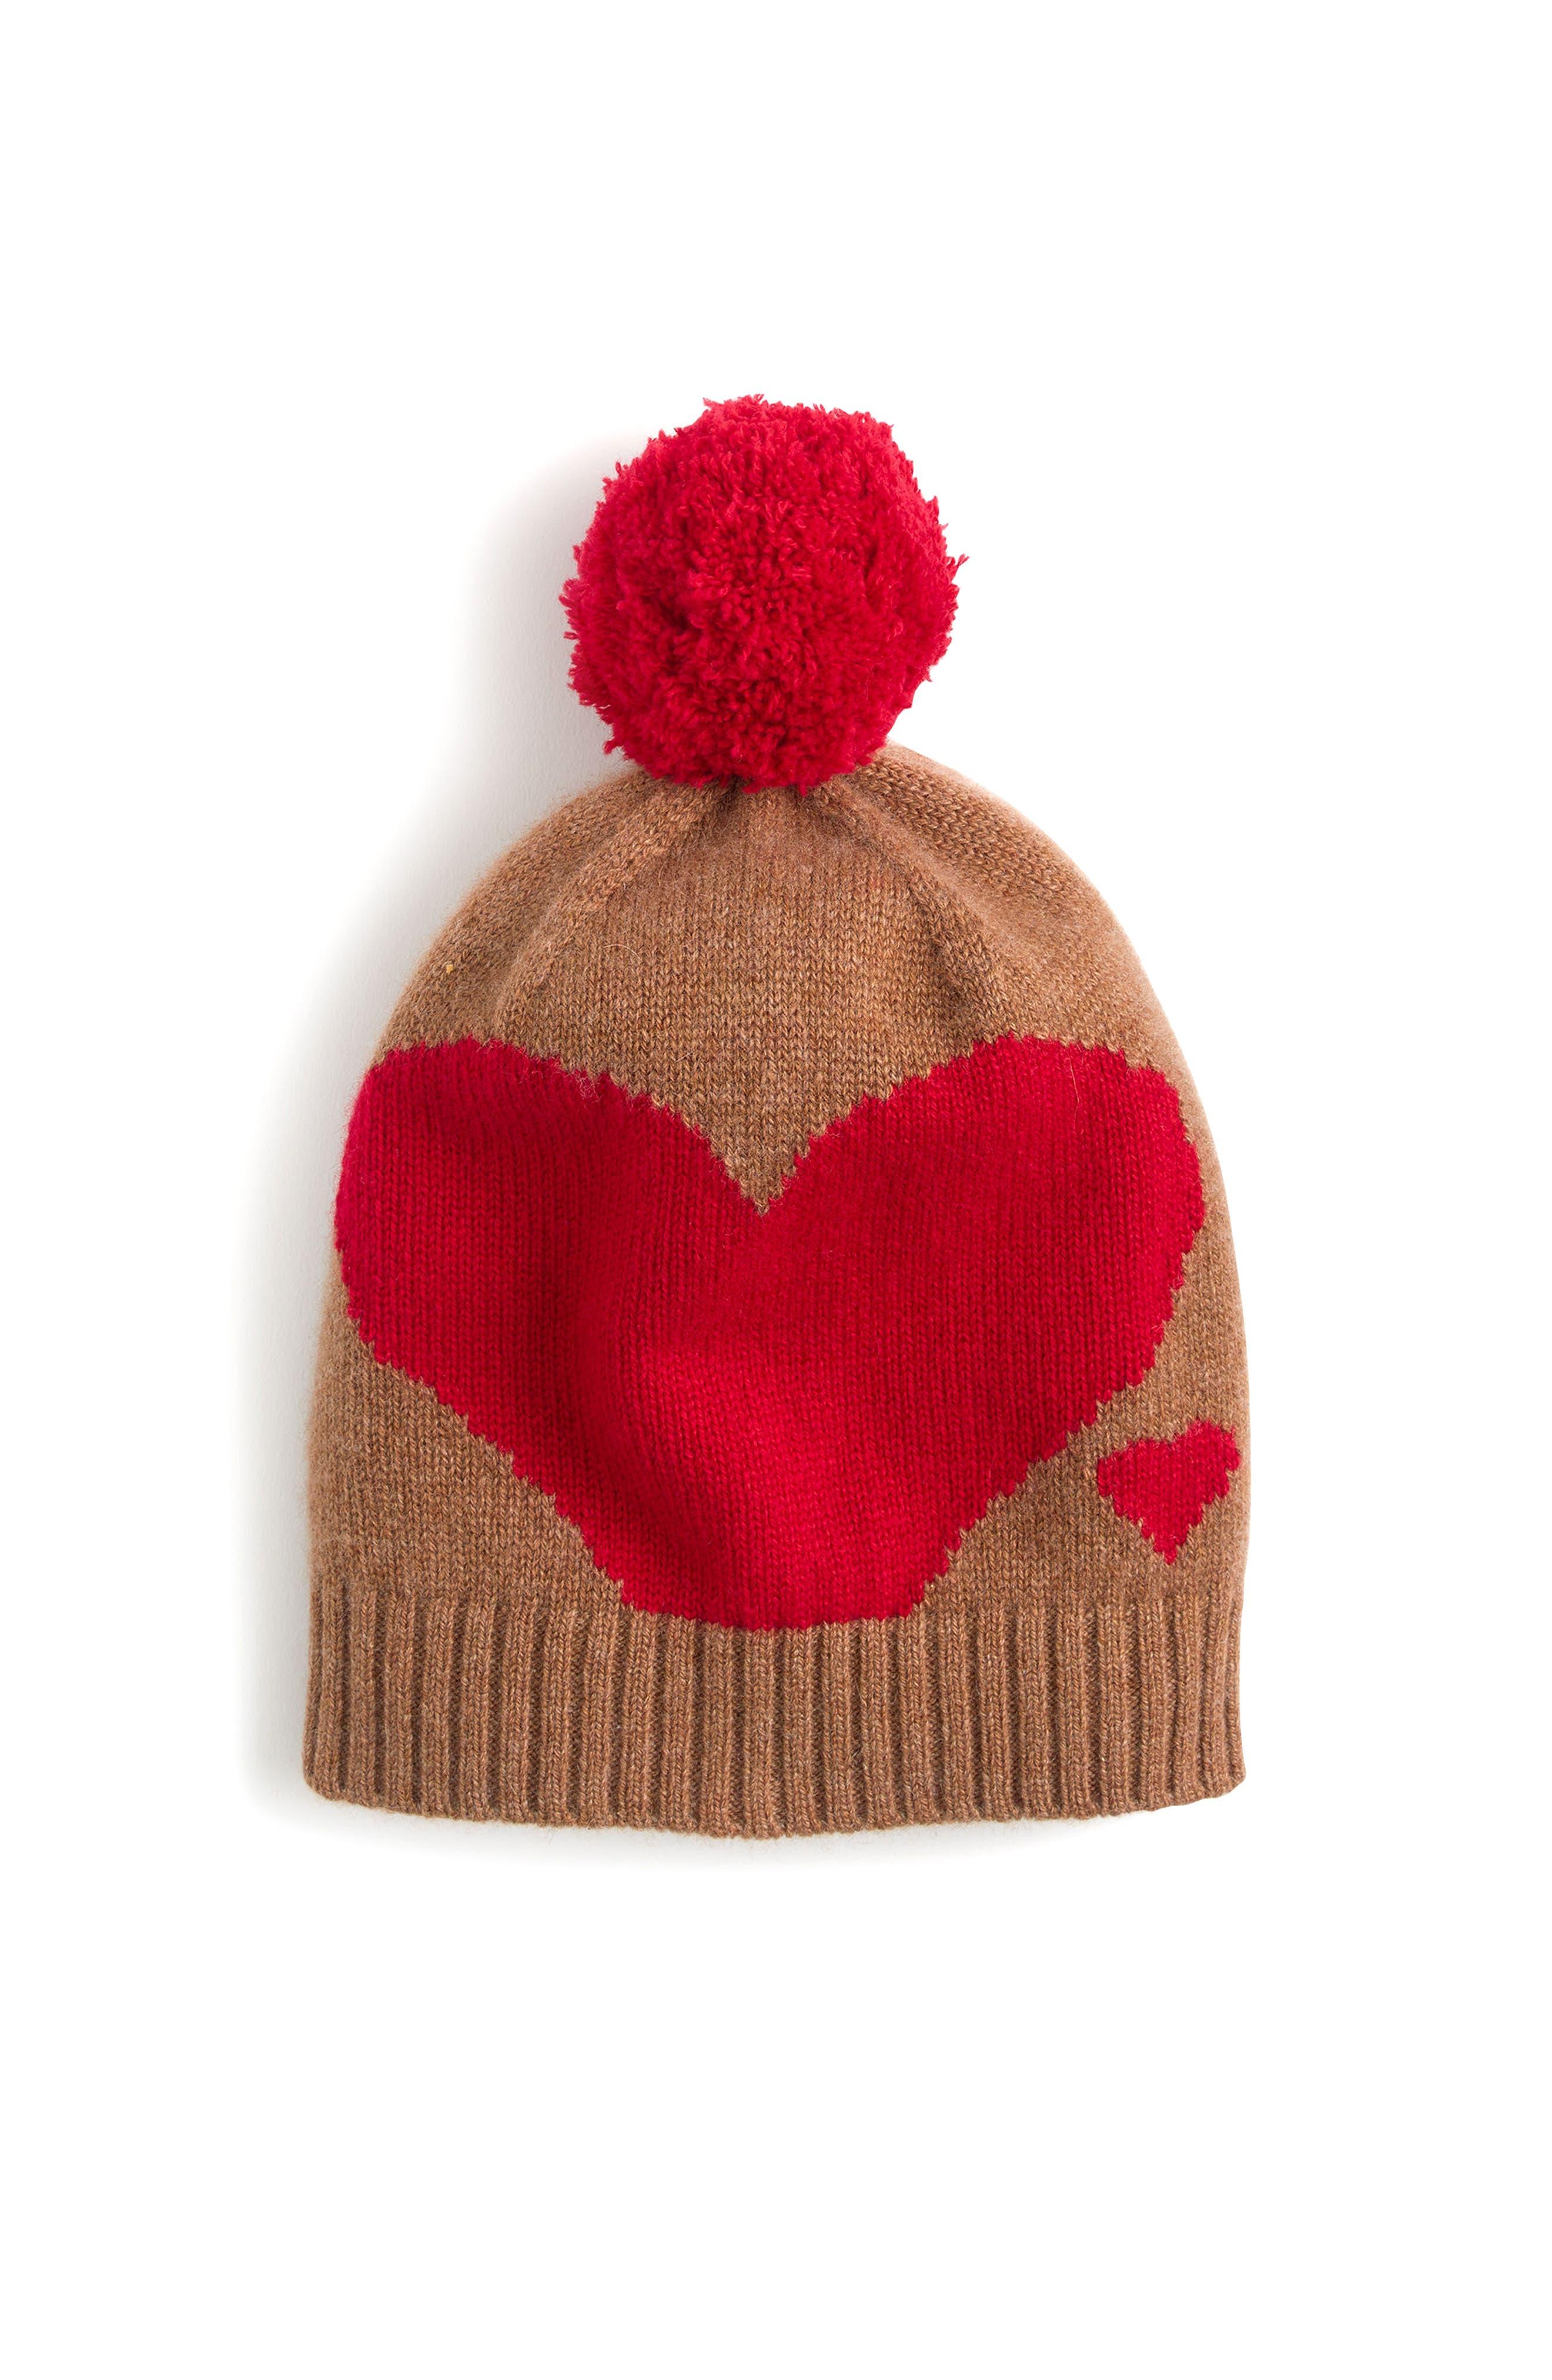 J.Crew Cashmere Heart Beanie